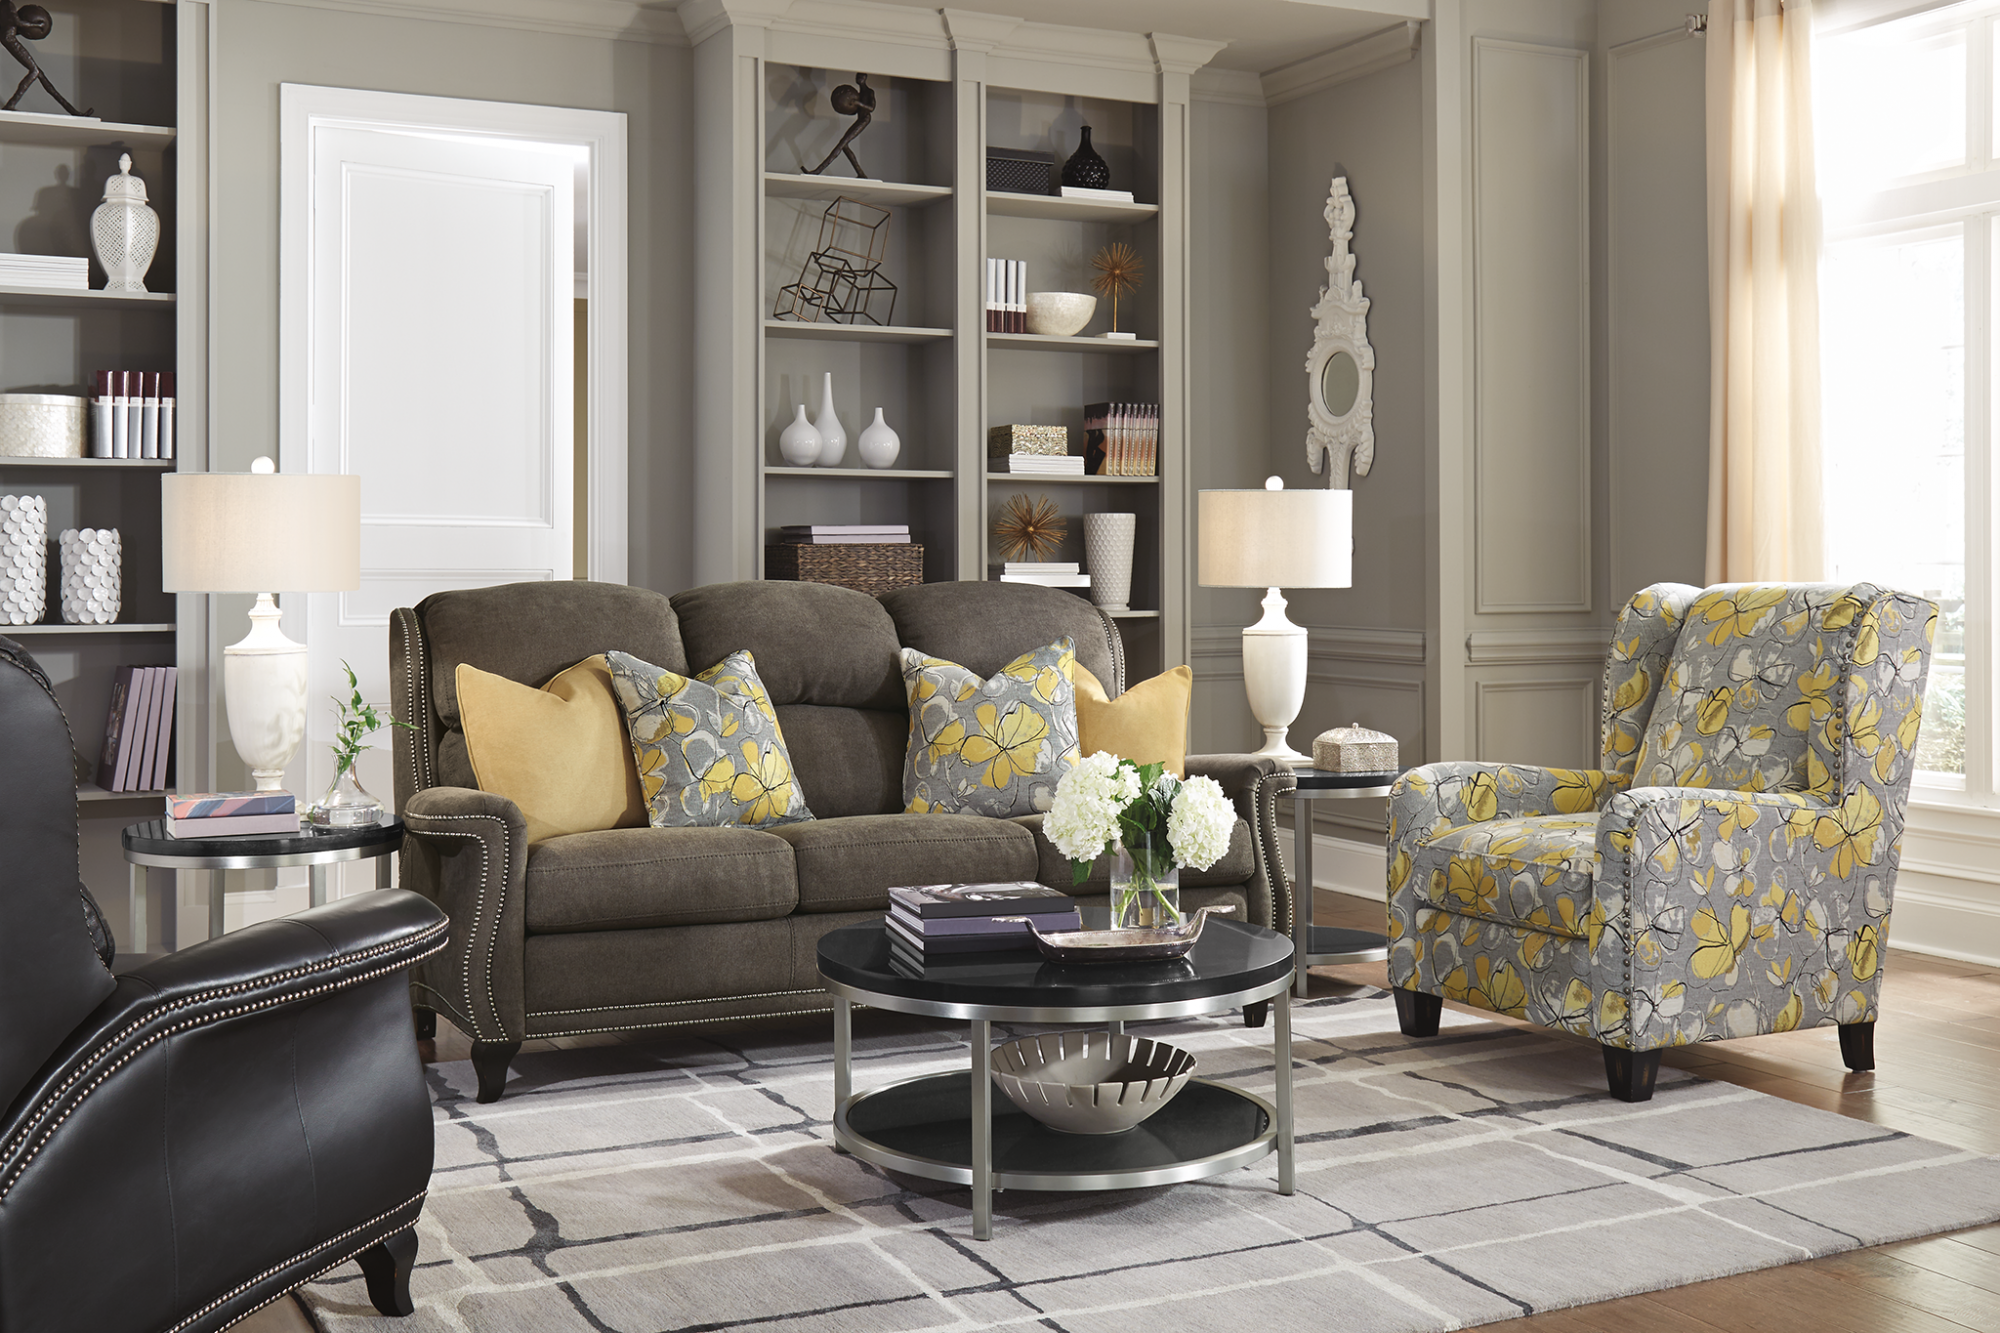 Model: 0112-10 | Flexsteel Perth  Fabric Chair